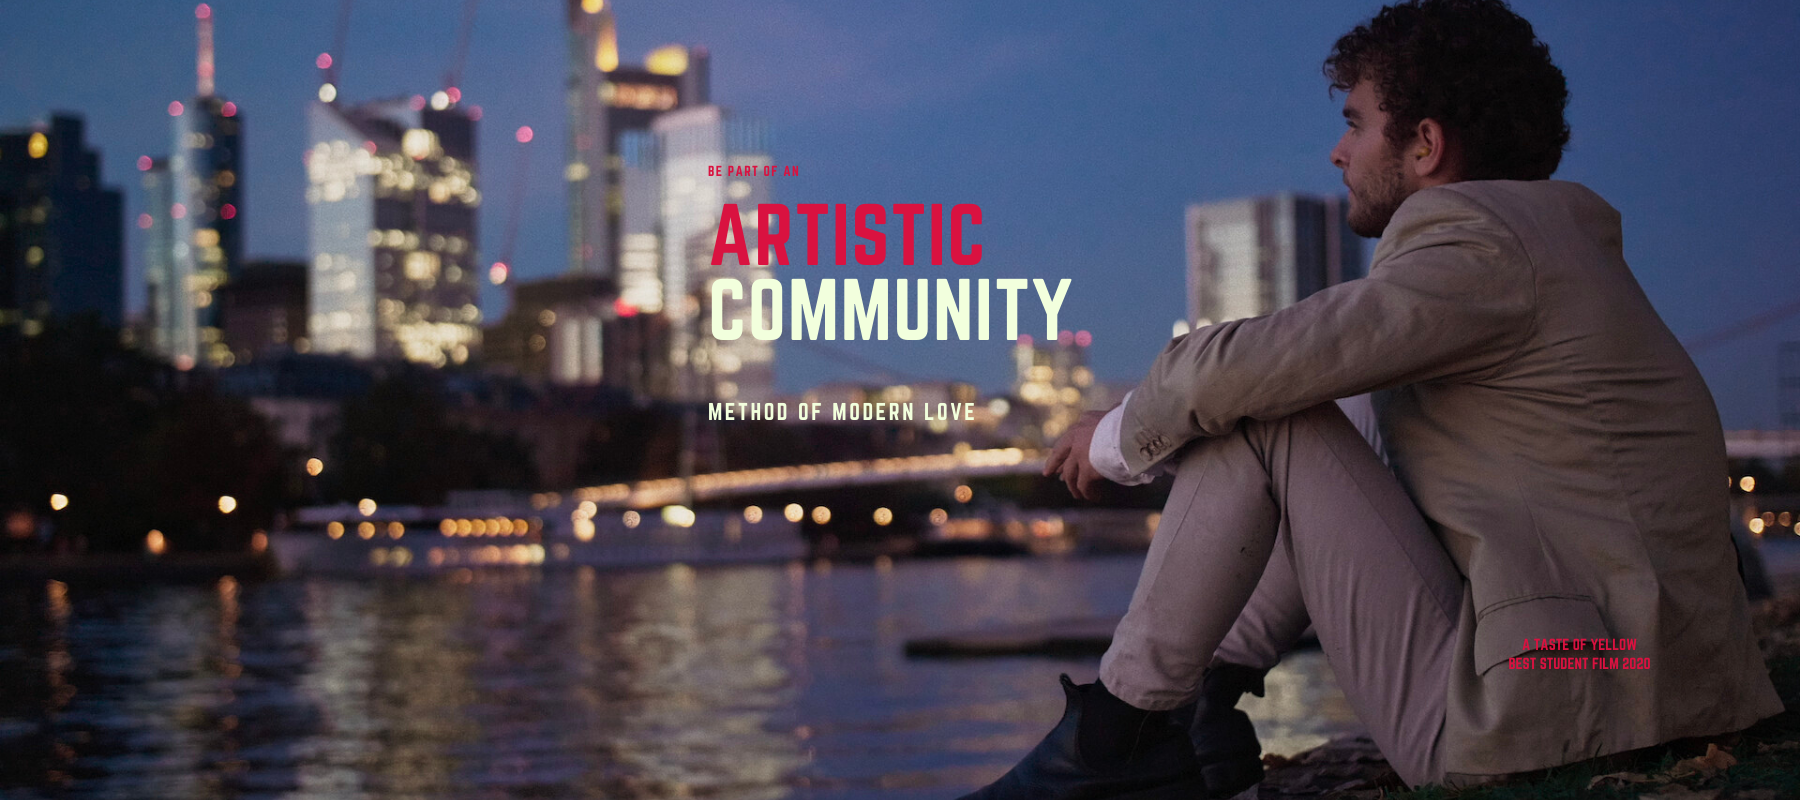 <a href='https://lovestoryfilmfestival.com/an-artistic-community'></a>